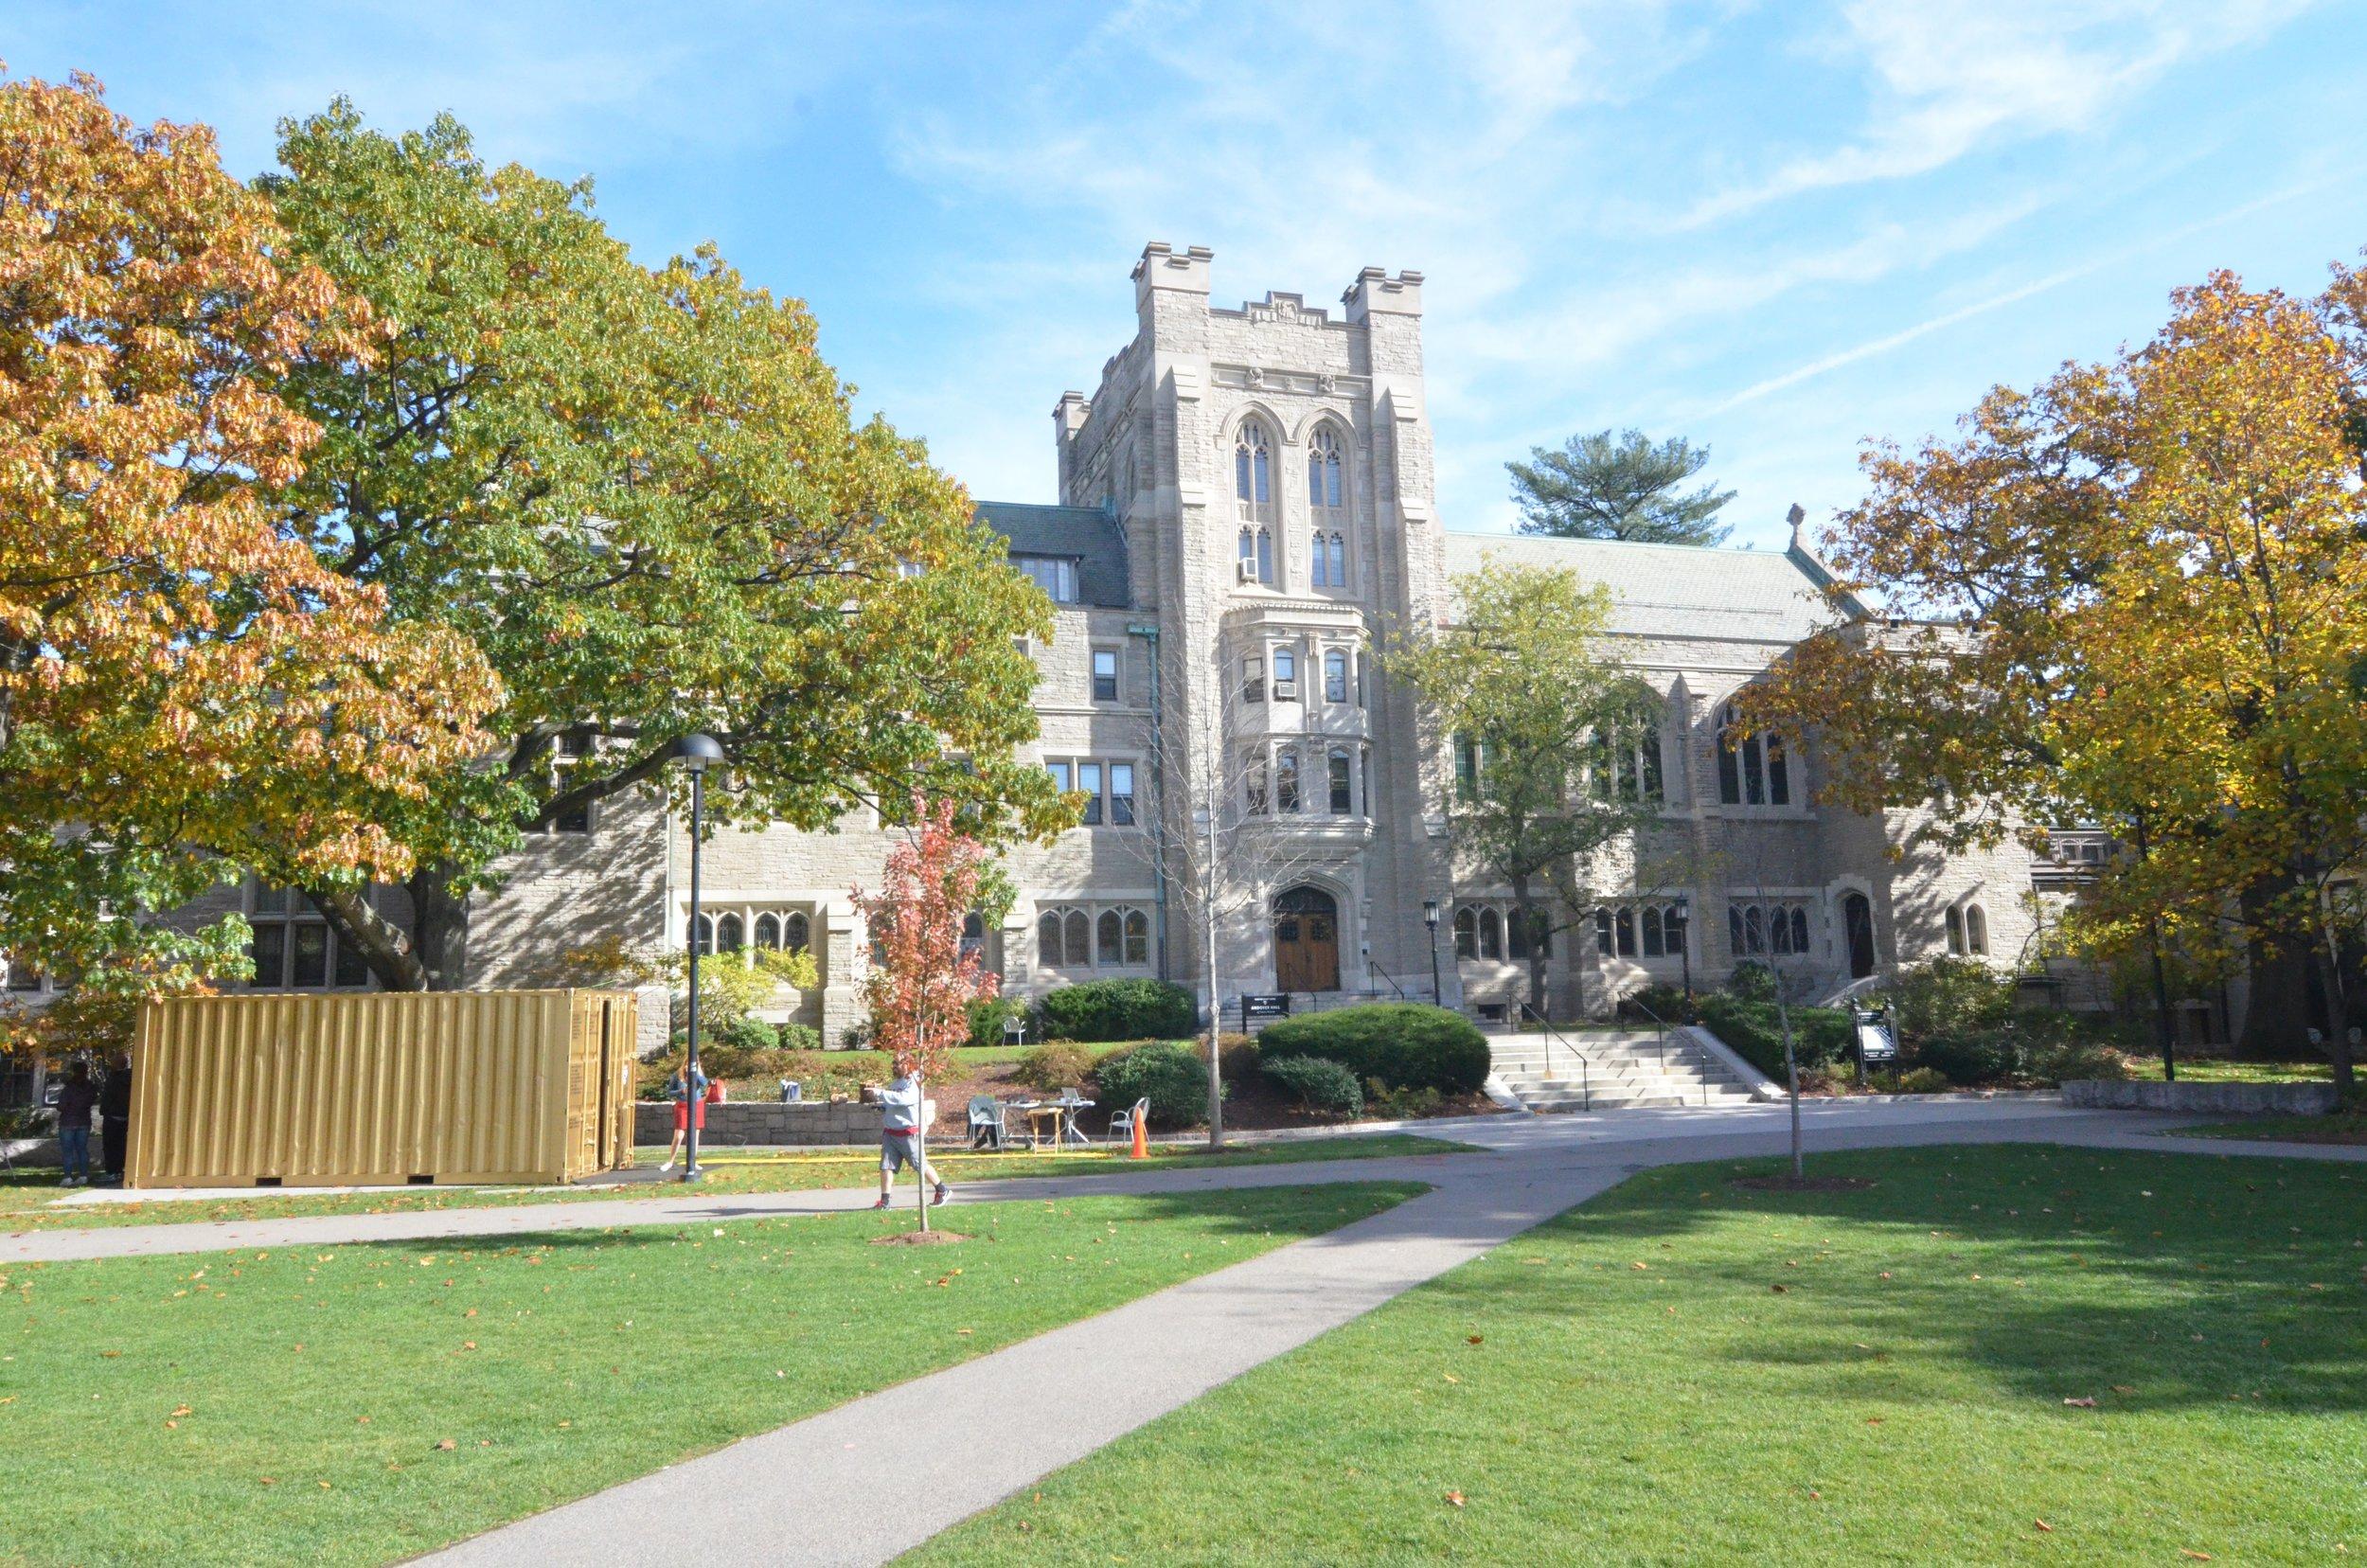 A Portal at Harvard Divinity School